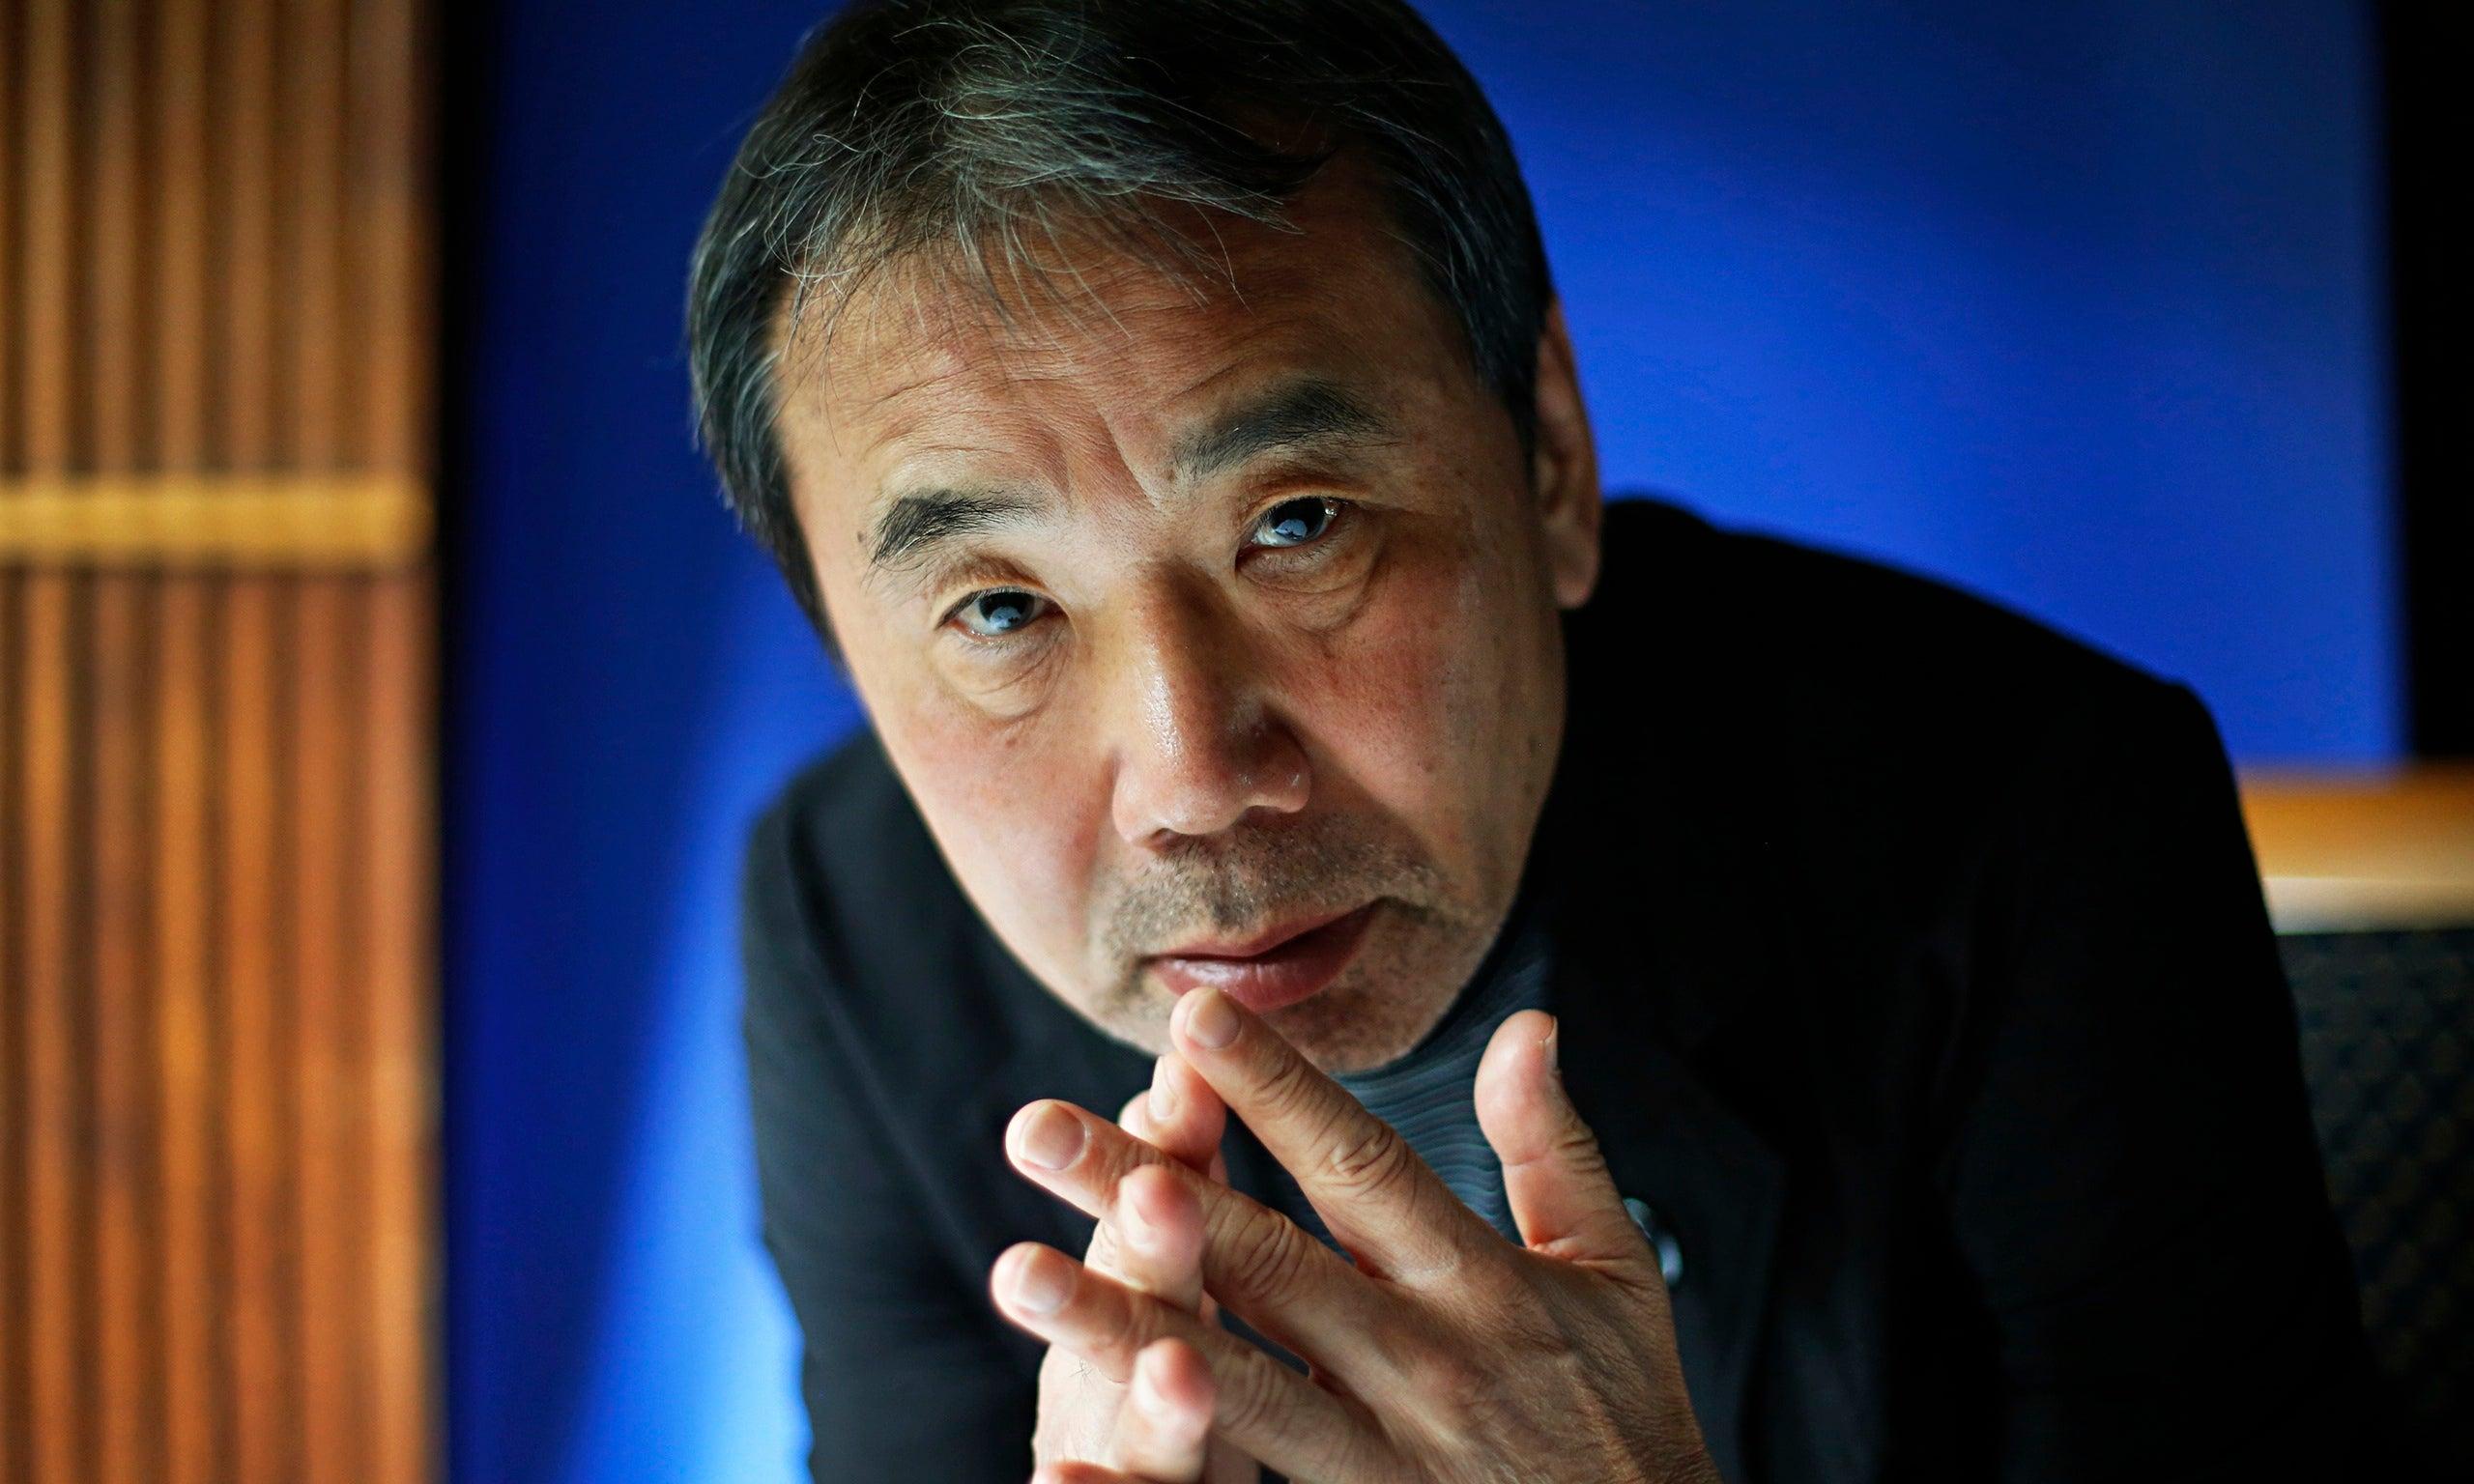 Haruki Murakami earned a  million dollar salary, leaving the net worth at 10 million in 2017